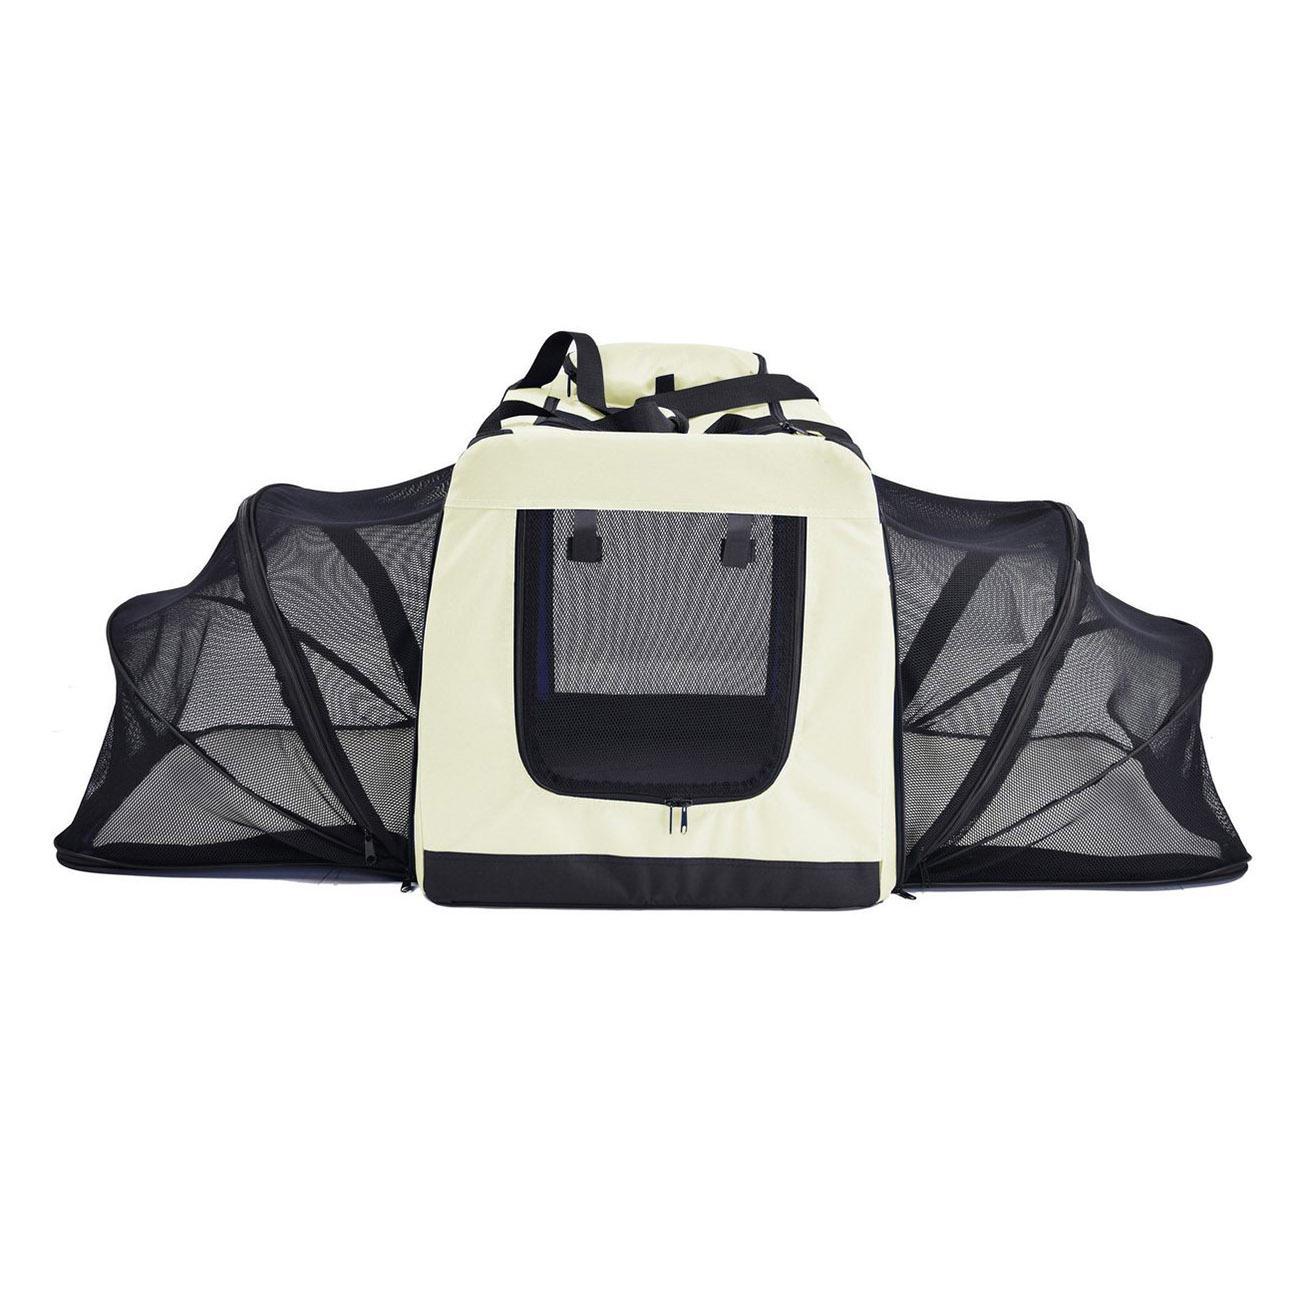 Pet Life Hounda Accordion Metal Frame Soft Folding Expandable Dog Crate - Khaki